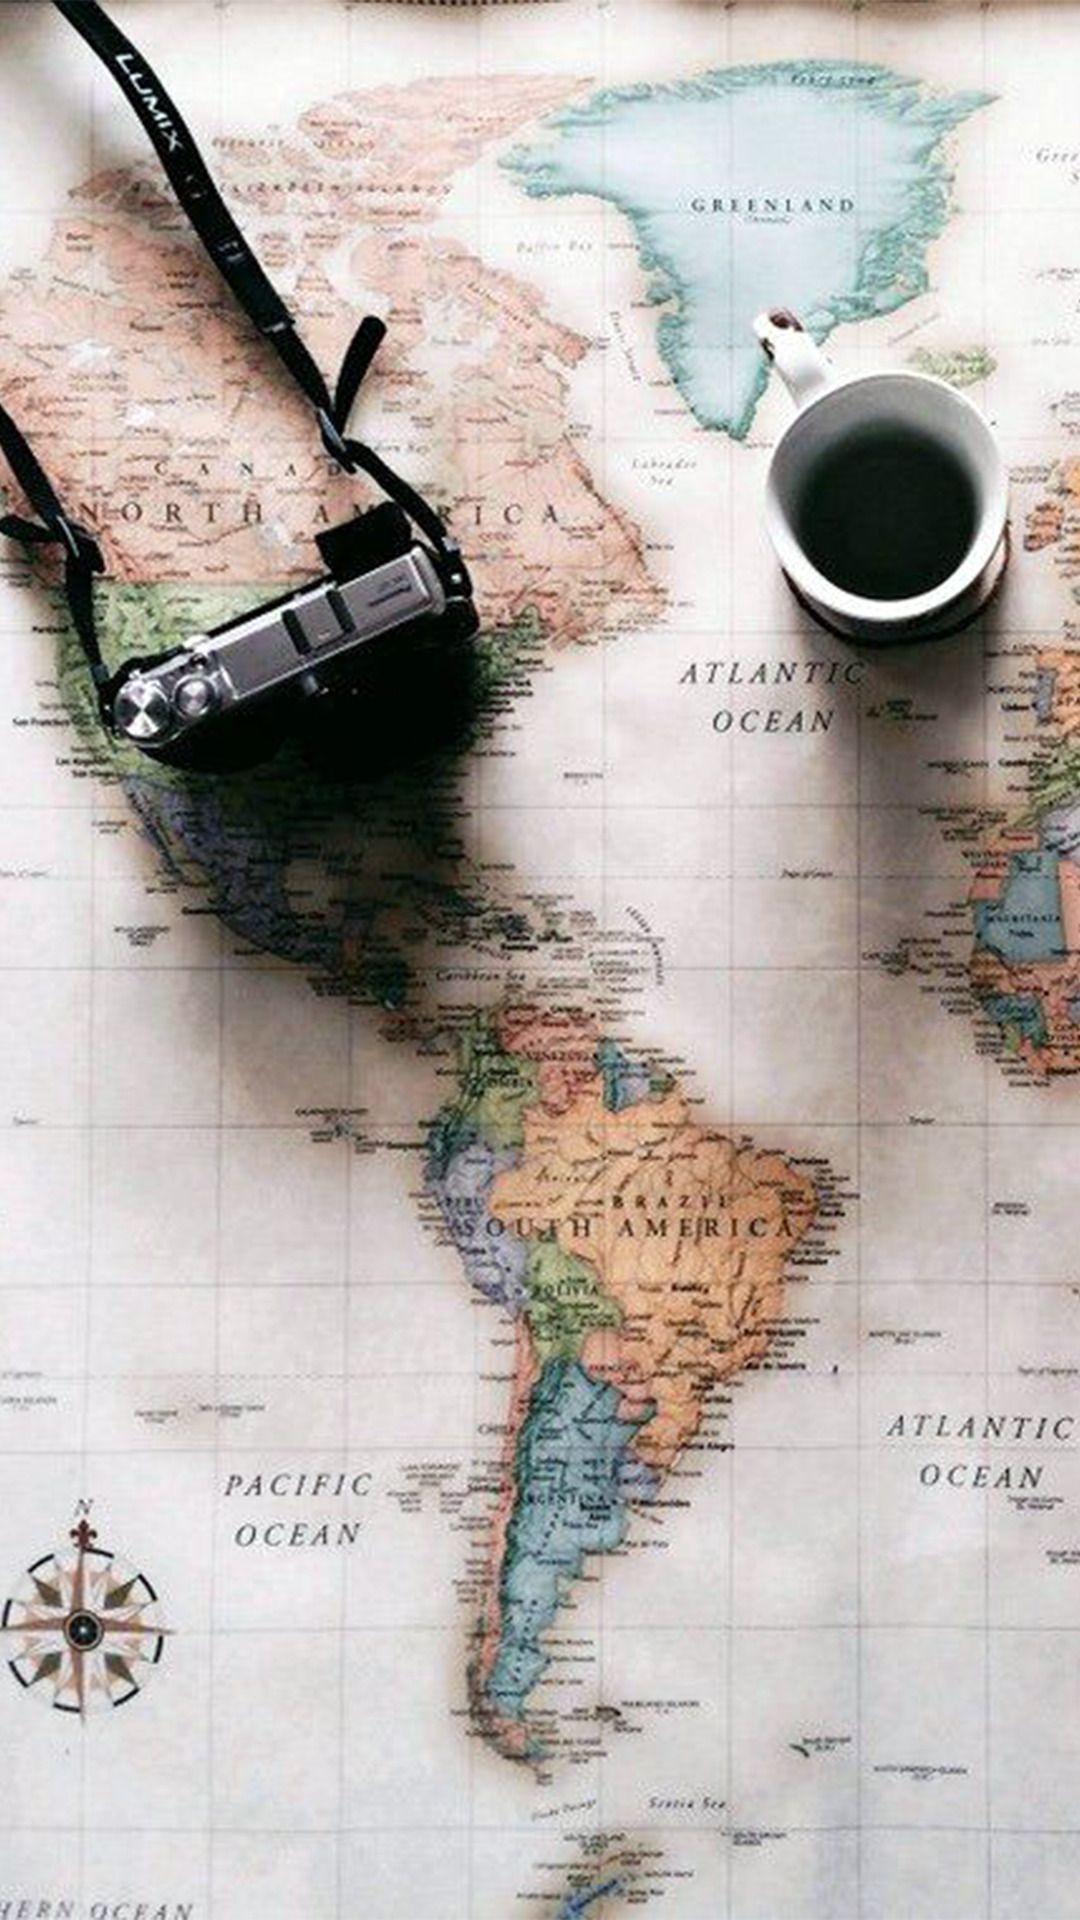 Iphone wallpaper tumblr travel - World Map Travel Plans Camera Coffee Iphone 6 Wallpaper